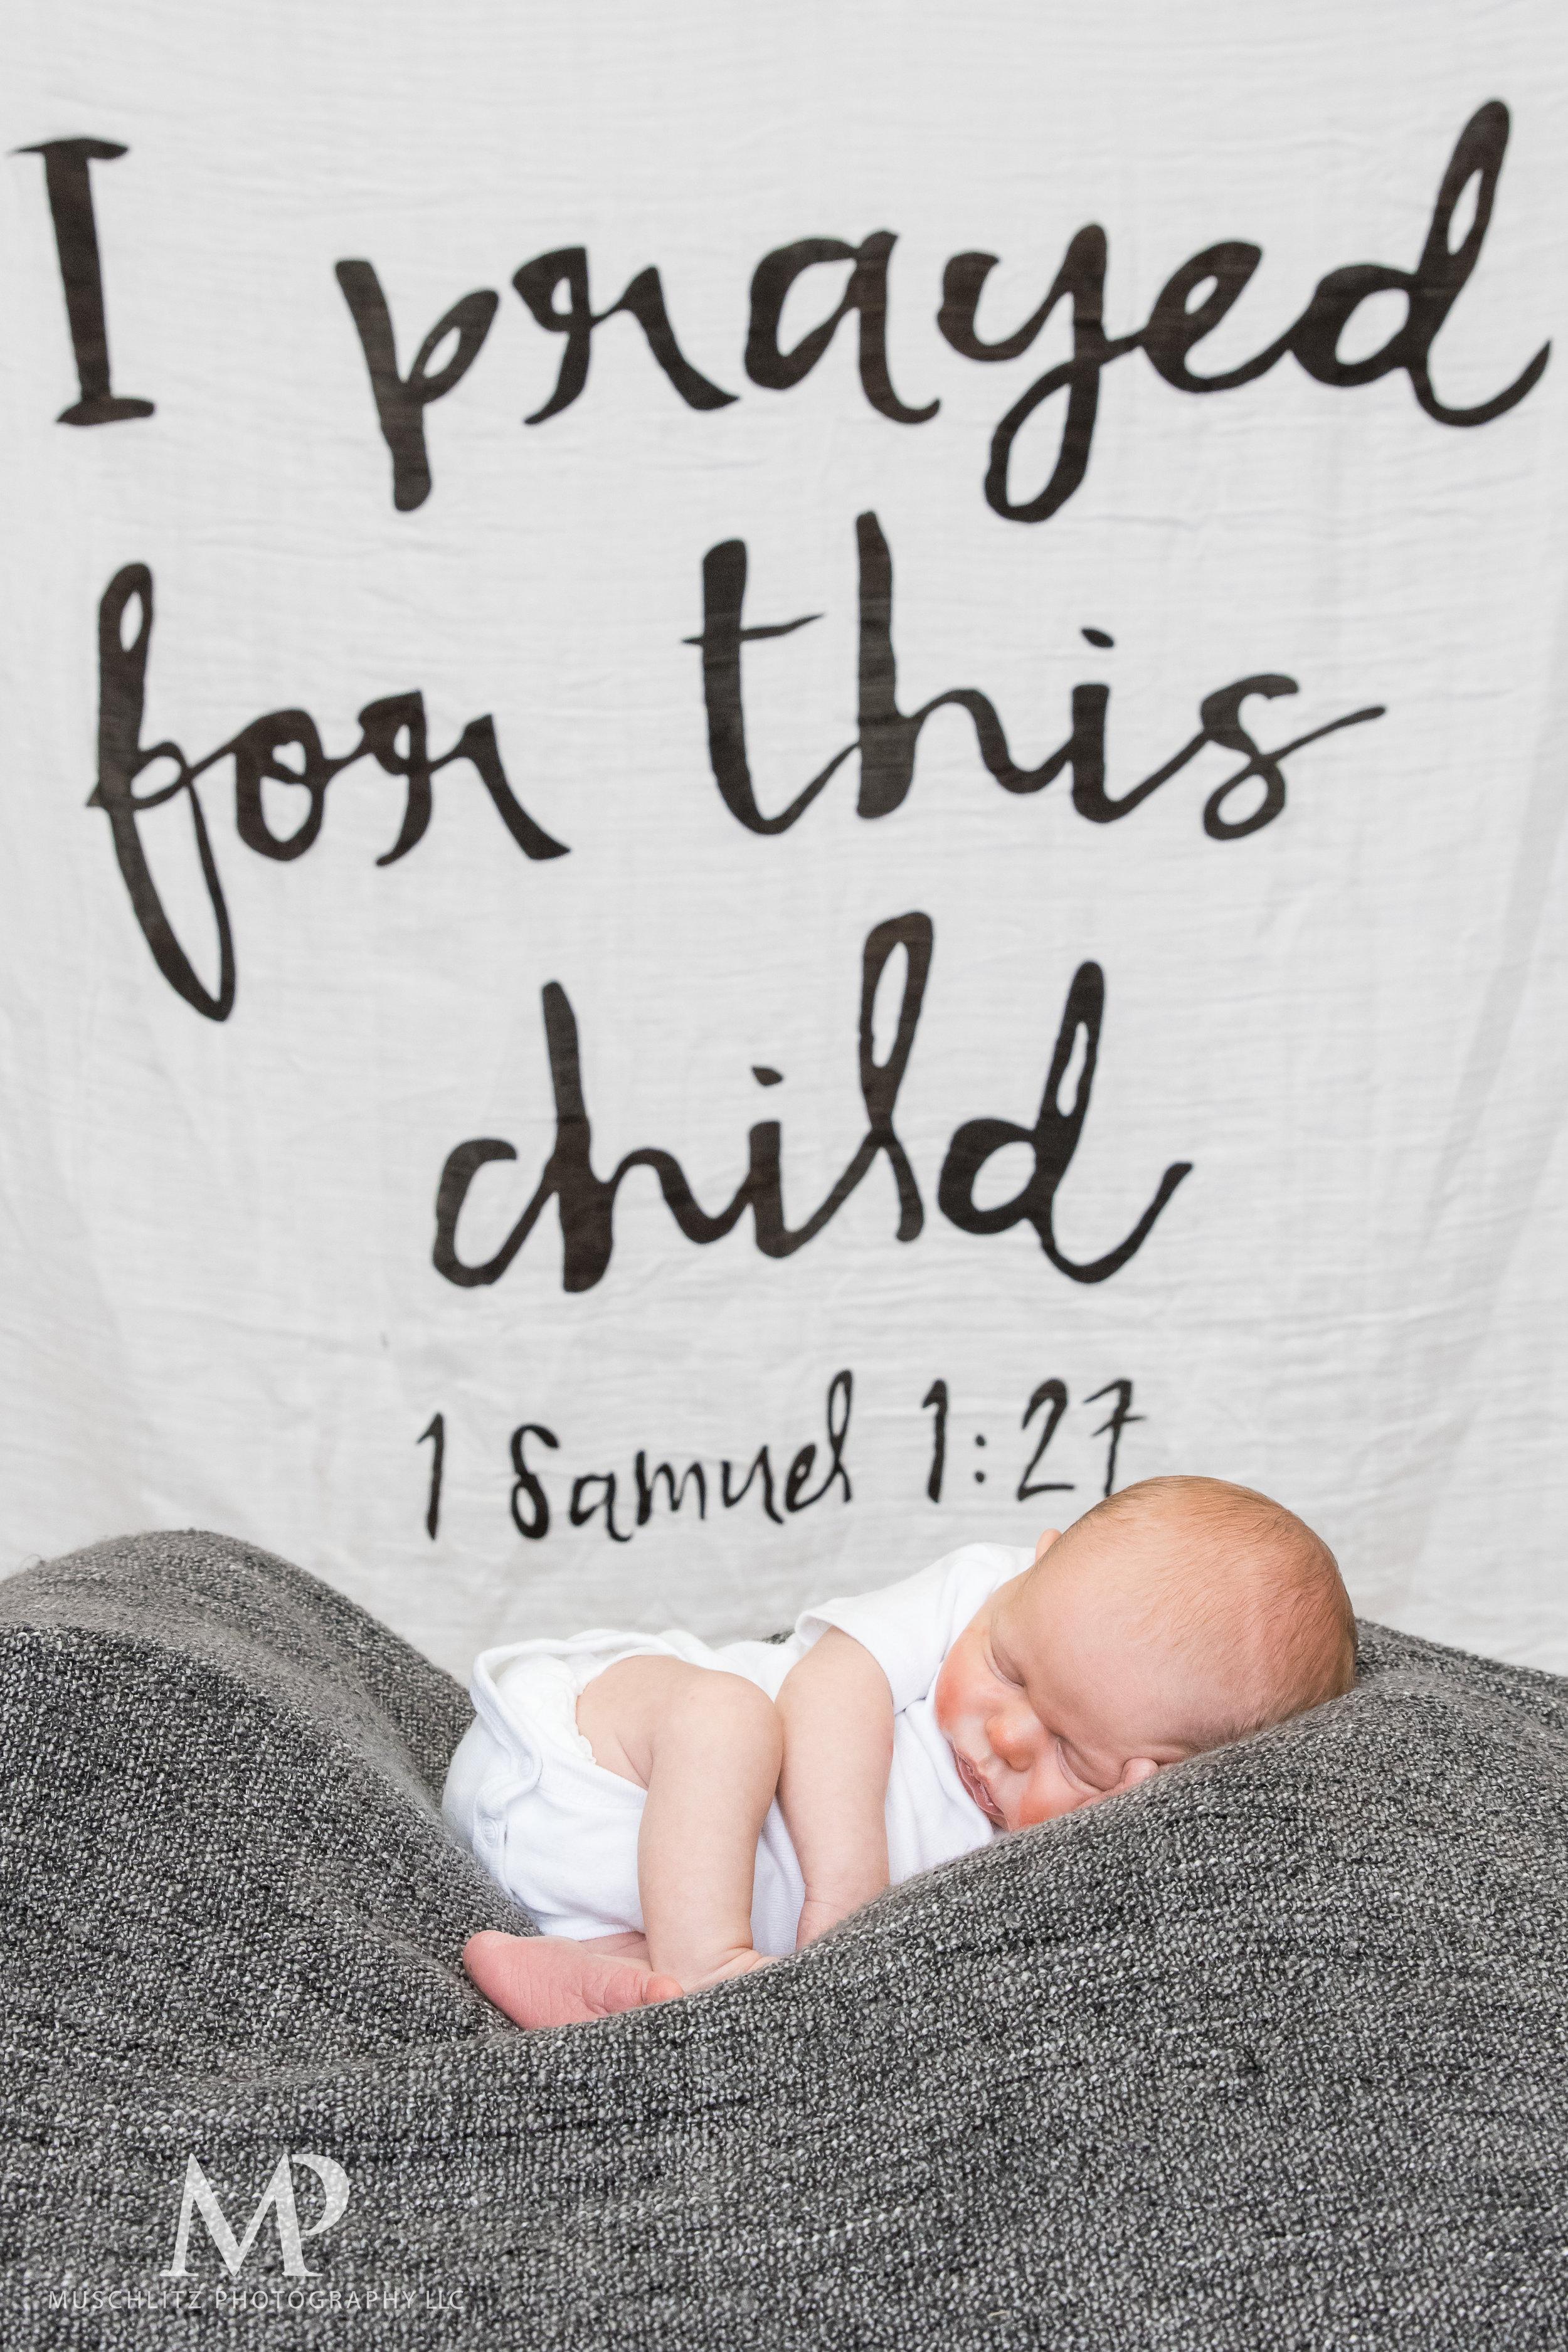 newborn-baby-portraits-photos-studio-holiday-columbus-gahanna-ohio-muschlitz-photography-023.JPG